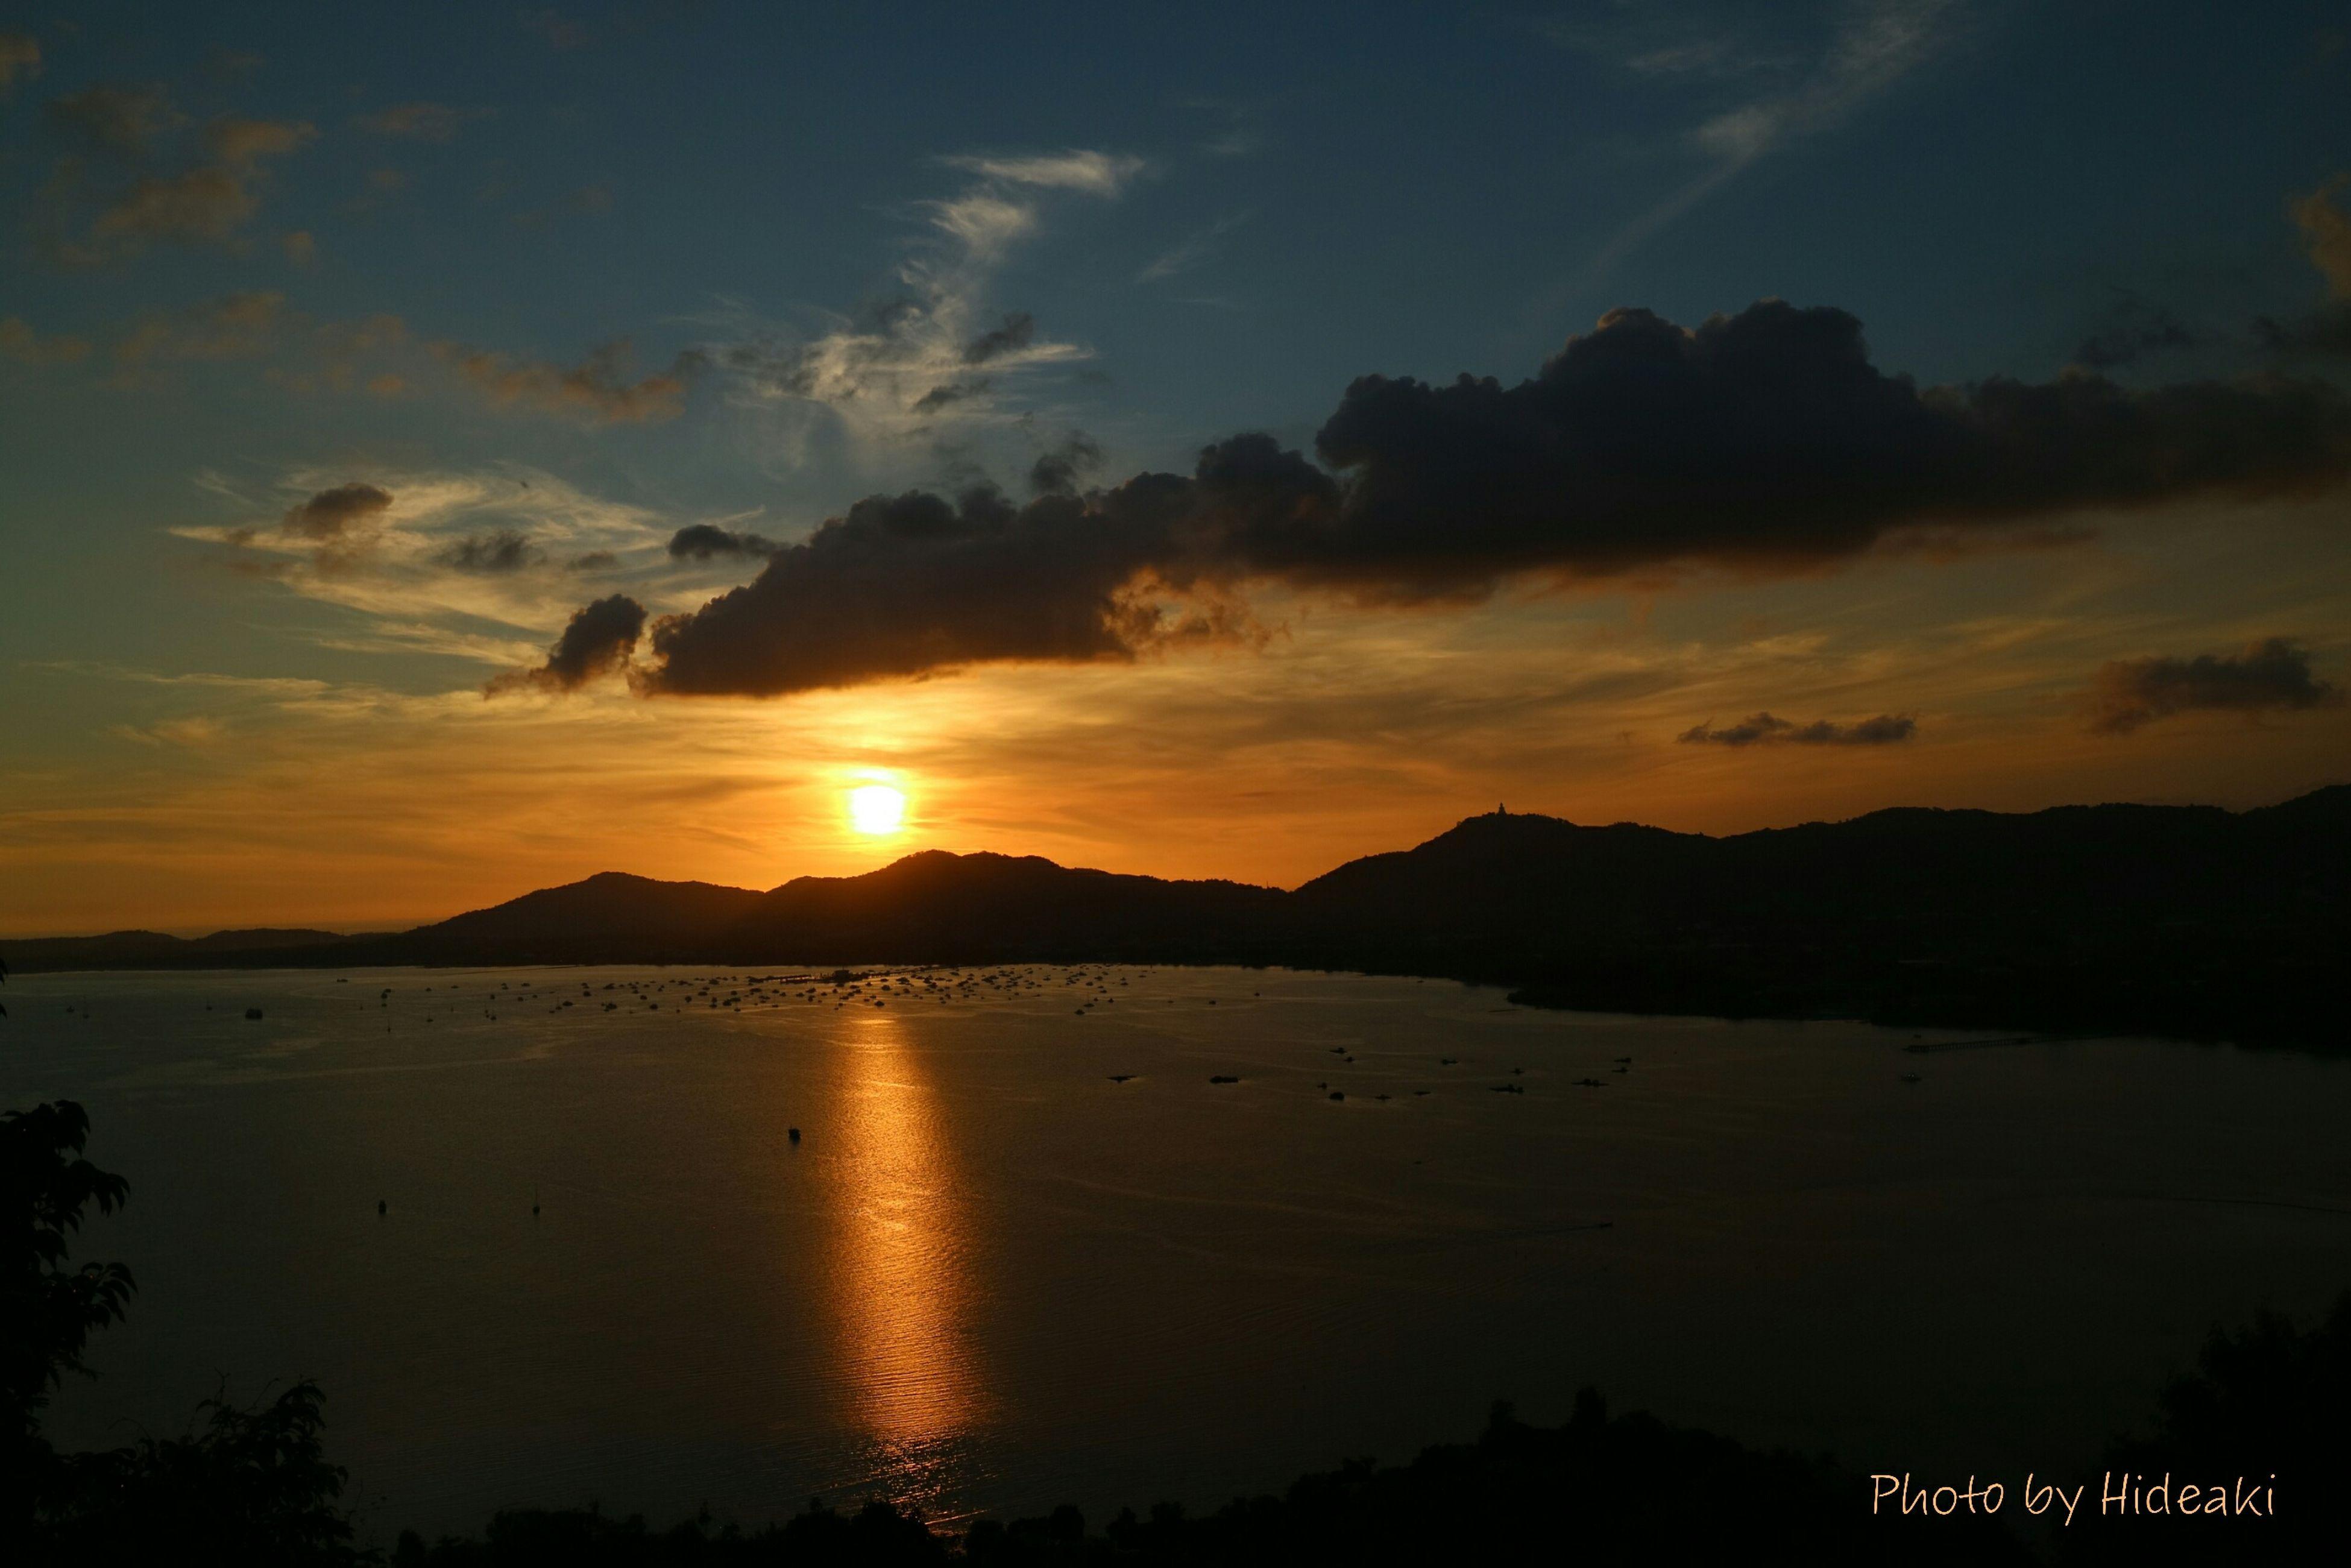 sunset, water, scenics, tranquil scene, mountain, sky, beauty in nature, tranquility, silhouette, sun, cloud - sky, idyllic, reflection, mountain range, nature, orange color, sea, lake, cloud, sunlight